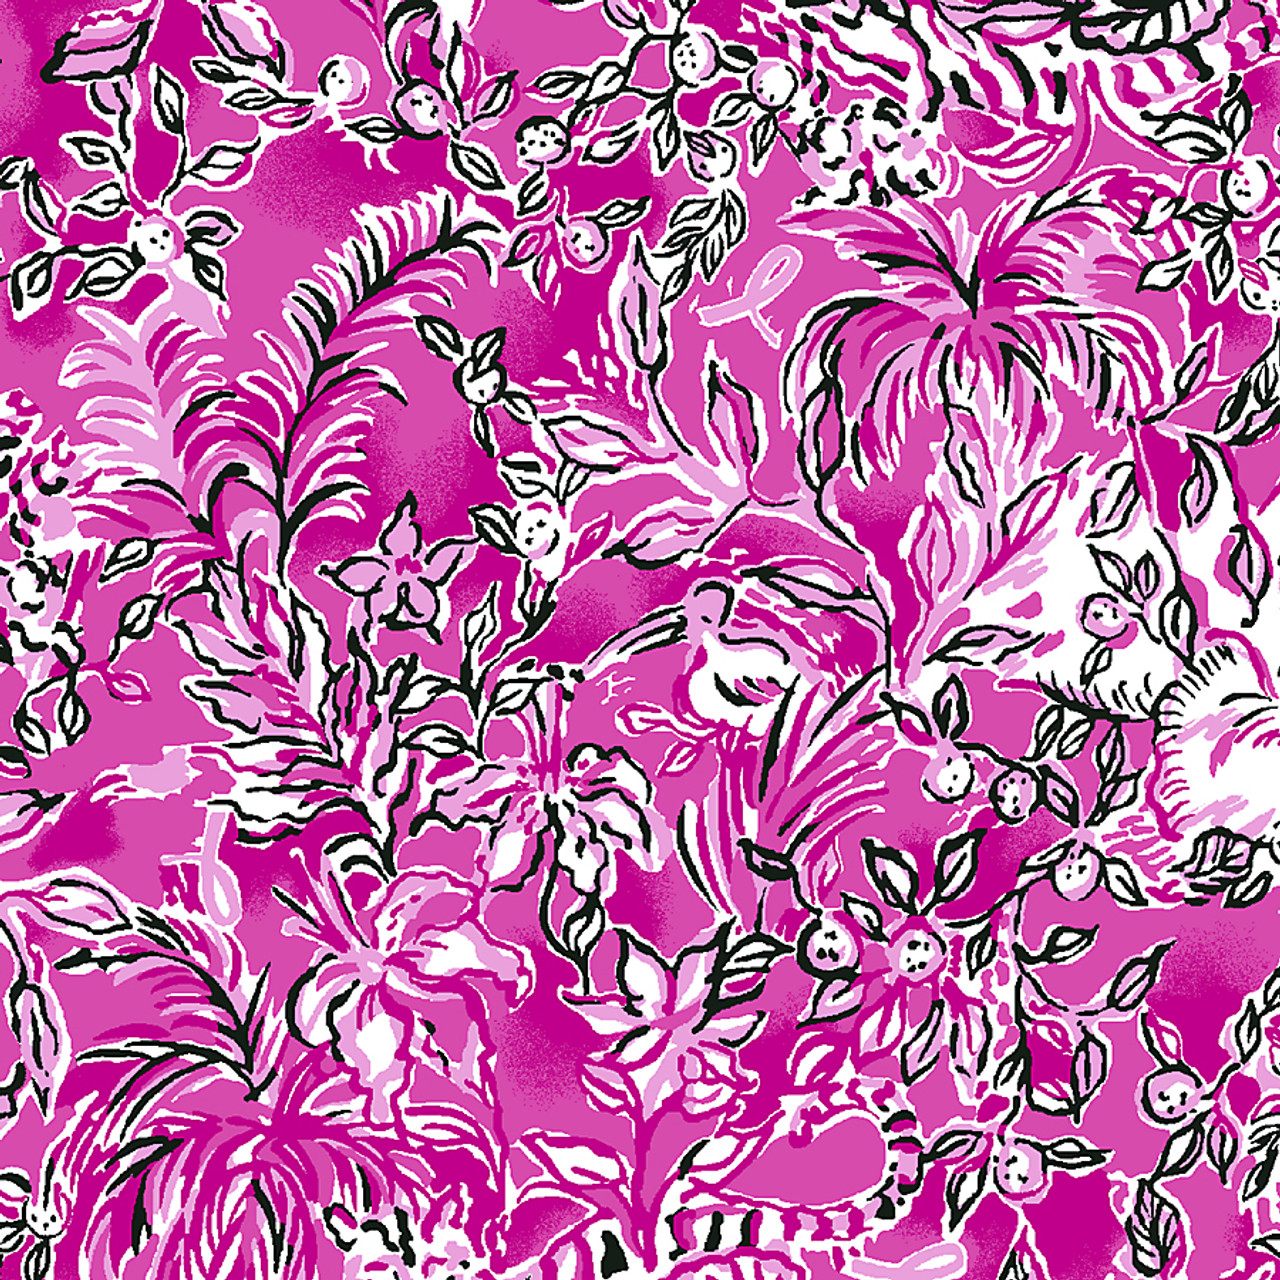 Purrposefully Pink